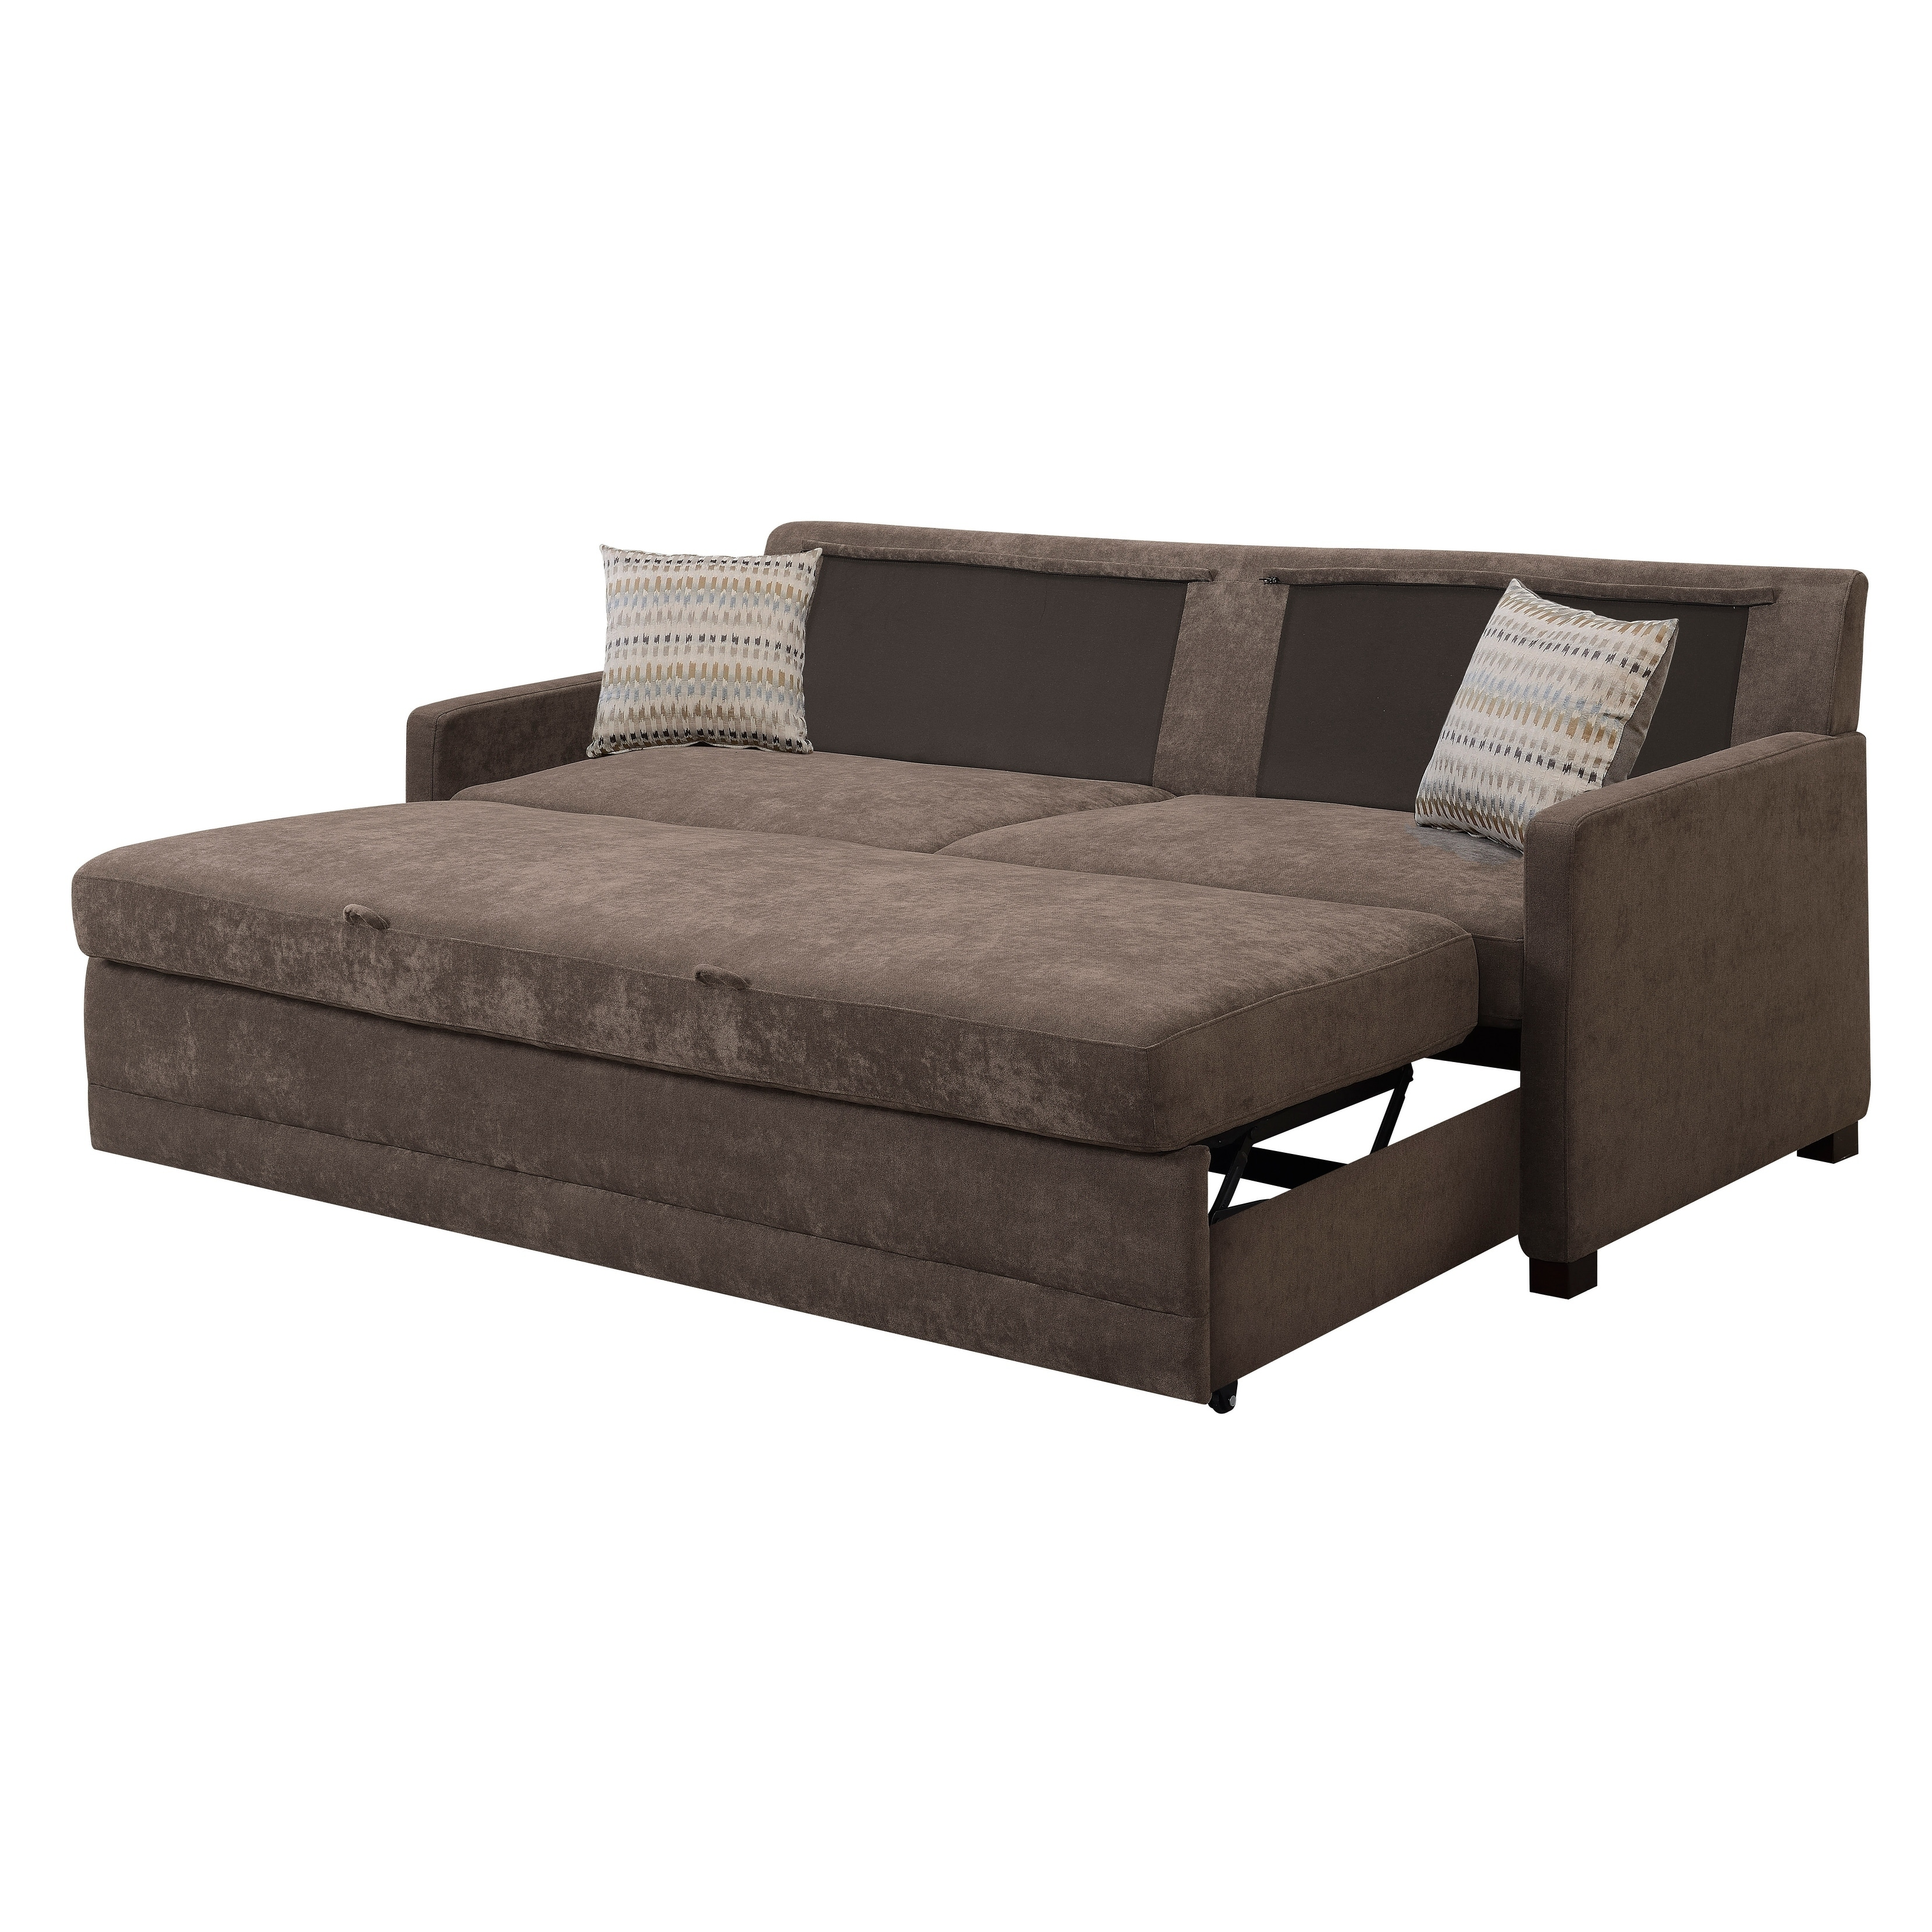 Shop Serta Salinas Dream Convertible Sofa Queen Brown - Free ...